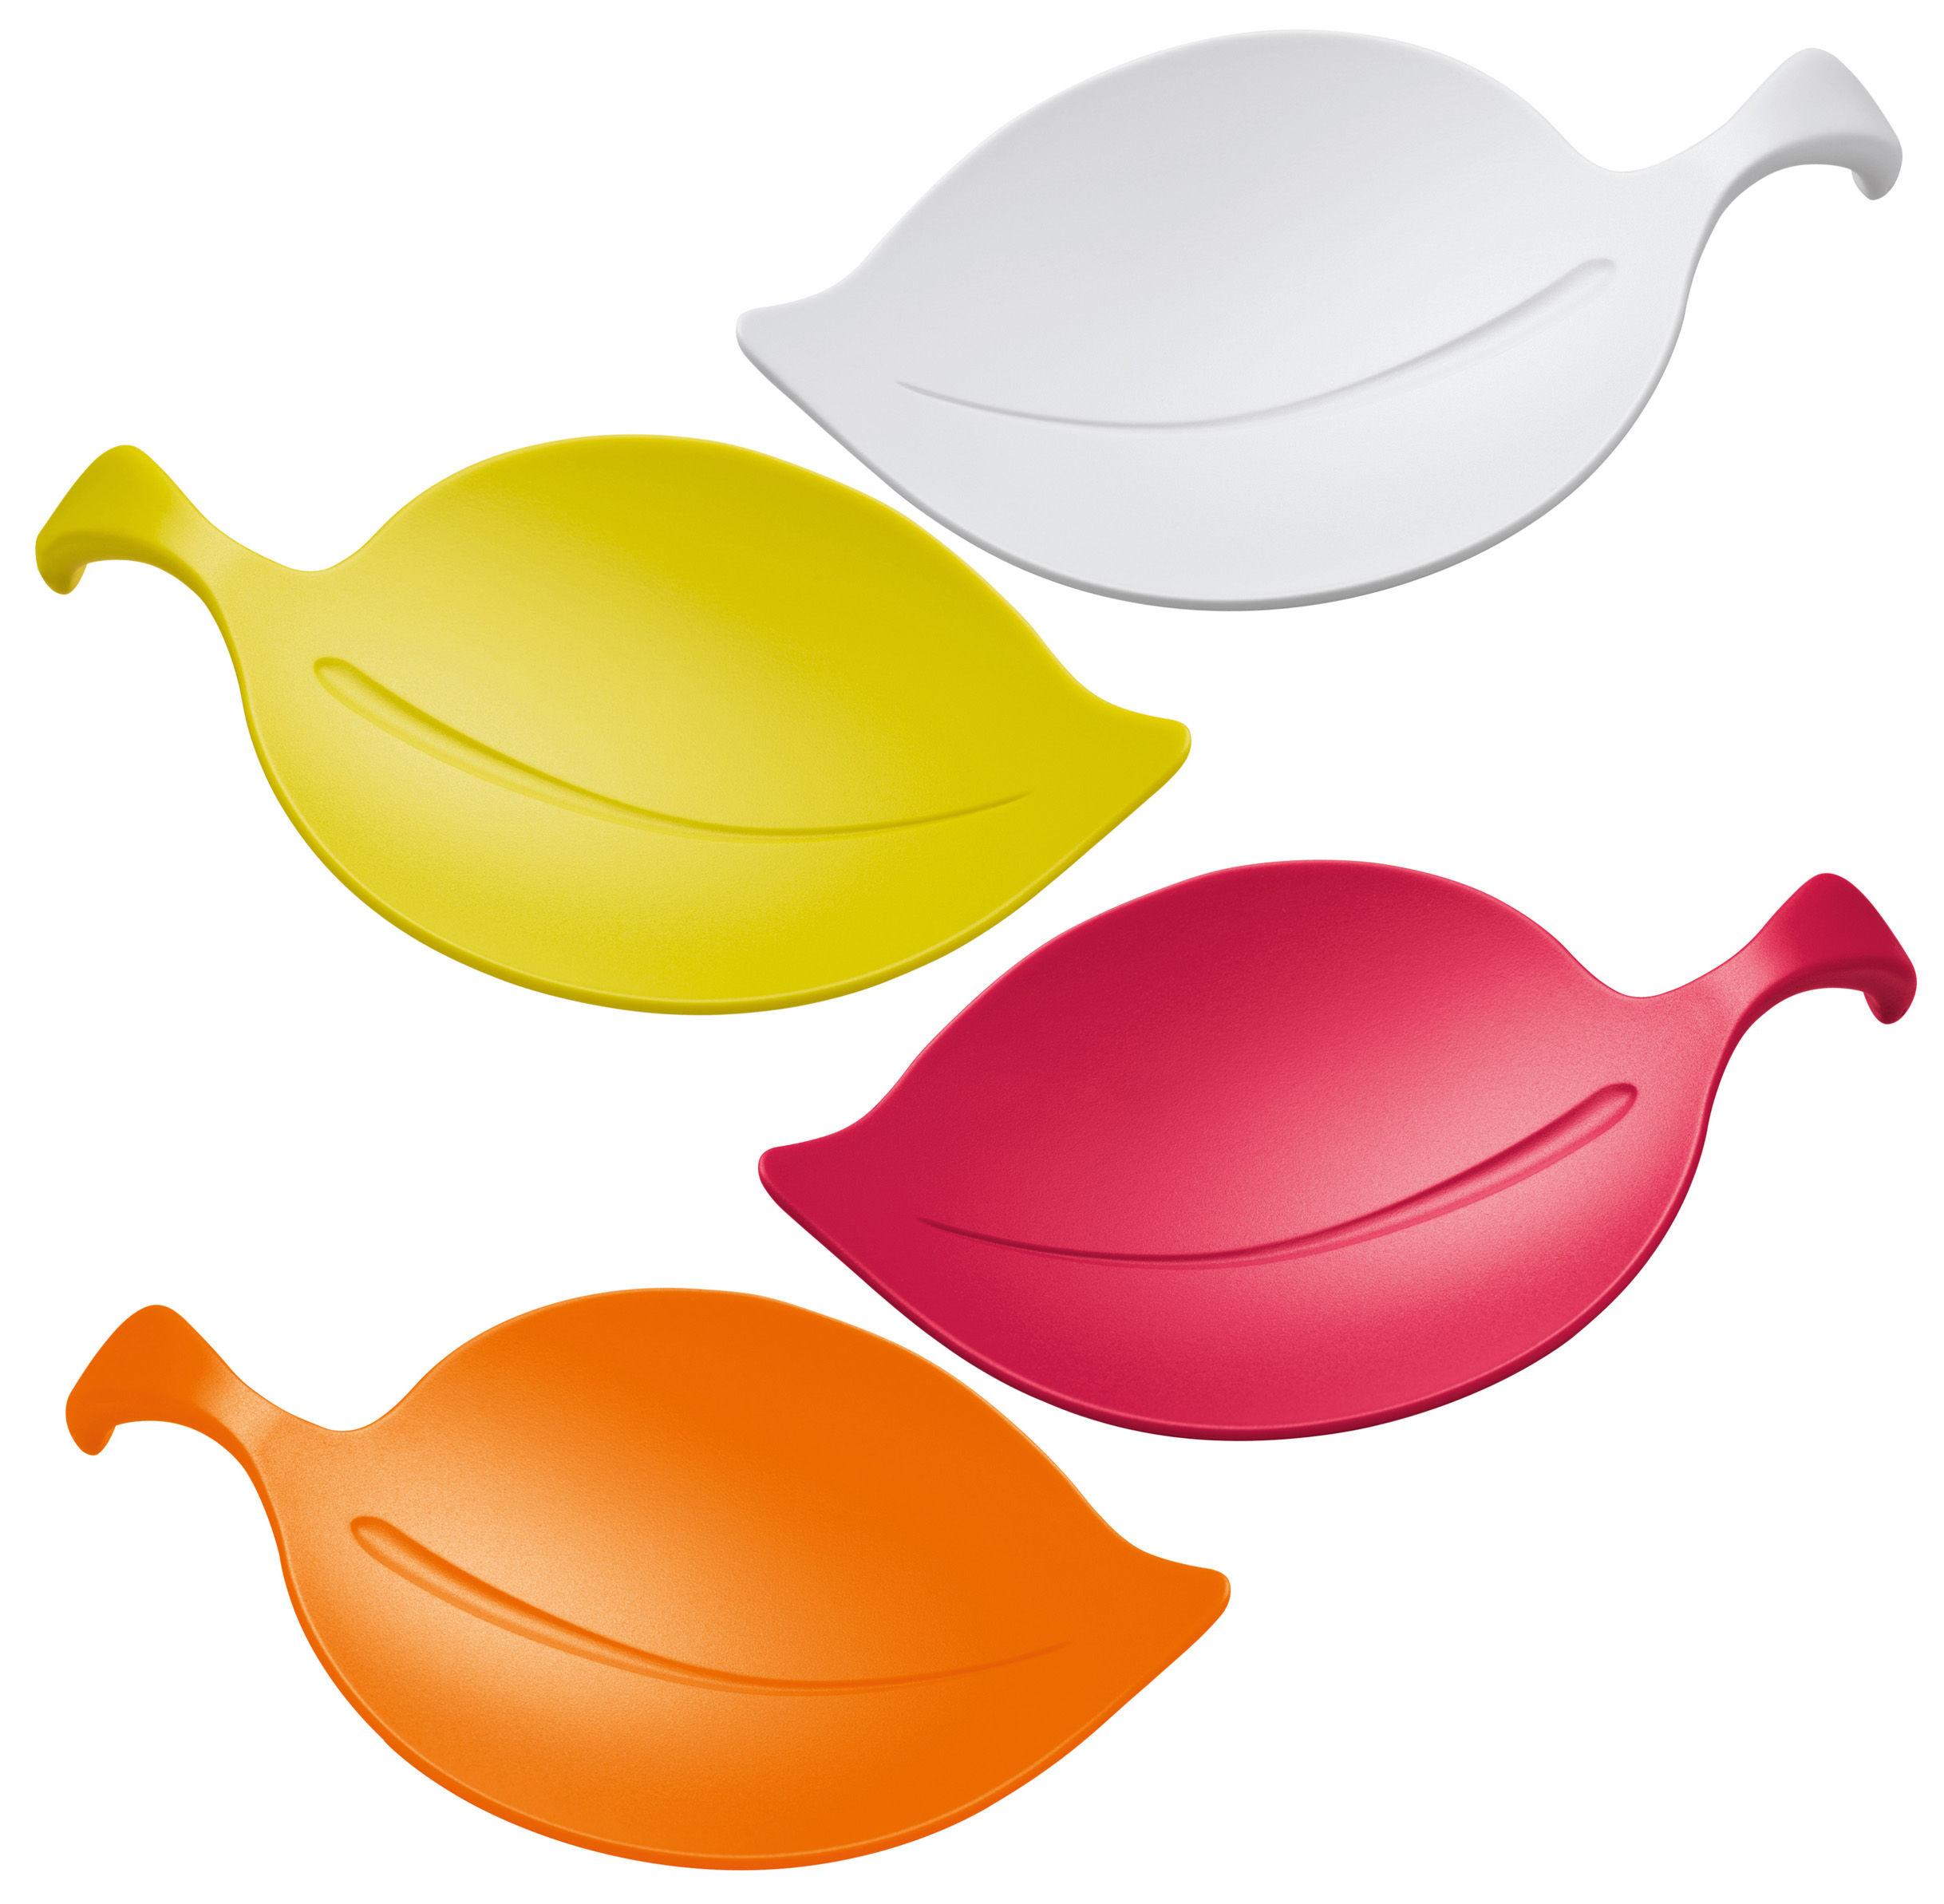 Tableware - Bowls - Leaf-on Small dish - Set of 4 by Koziol - White / mustard green / raspberry red /orange - Plastic